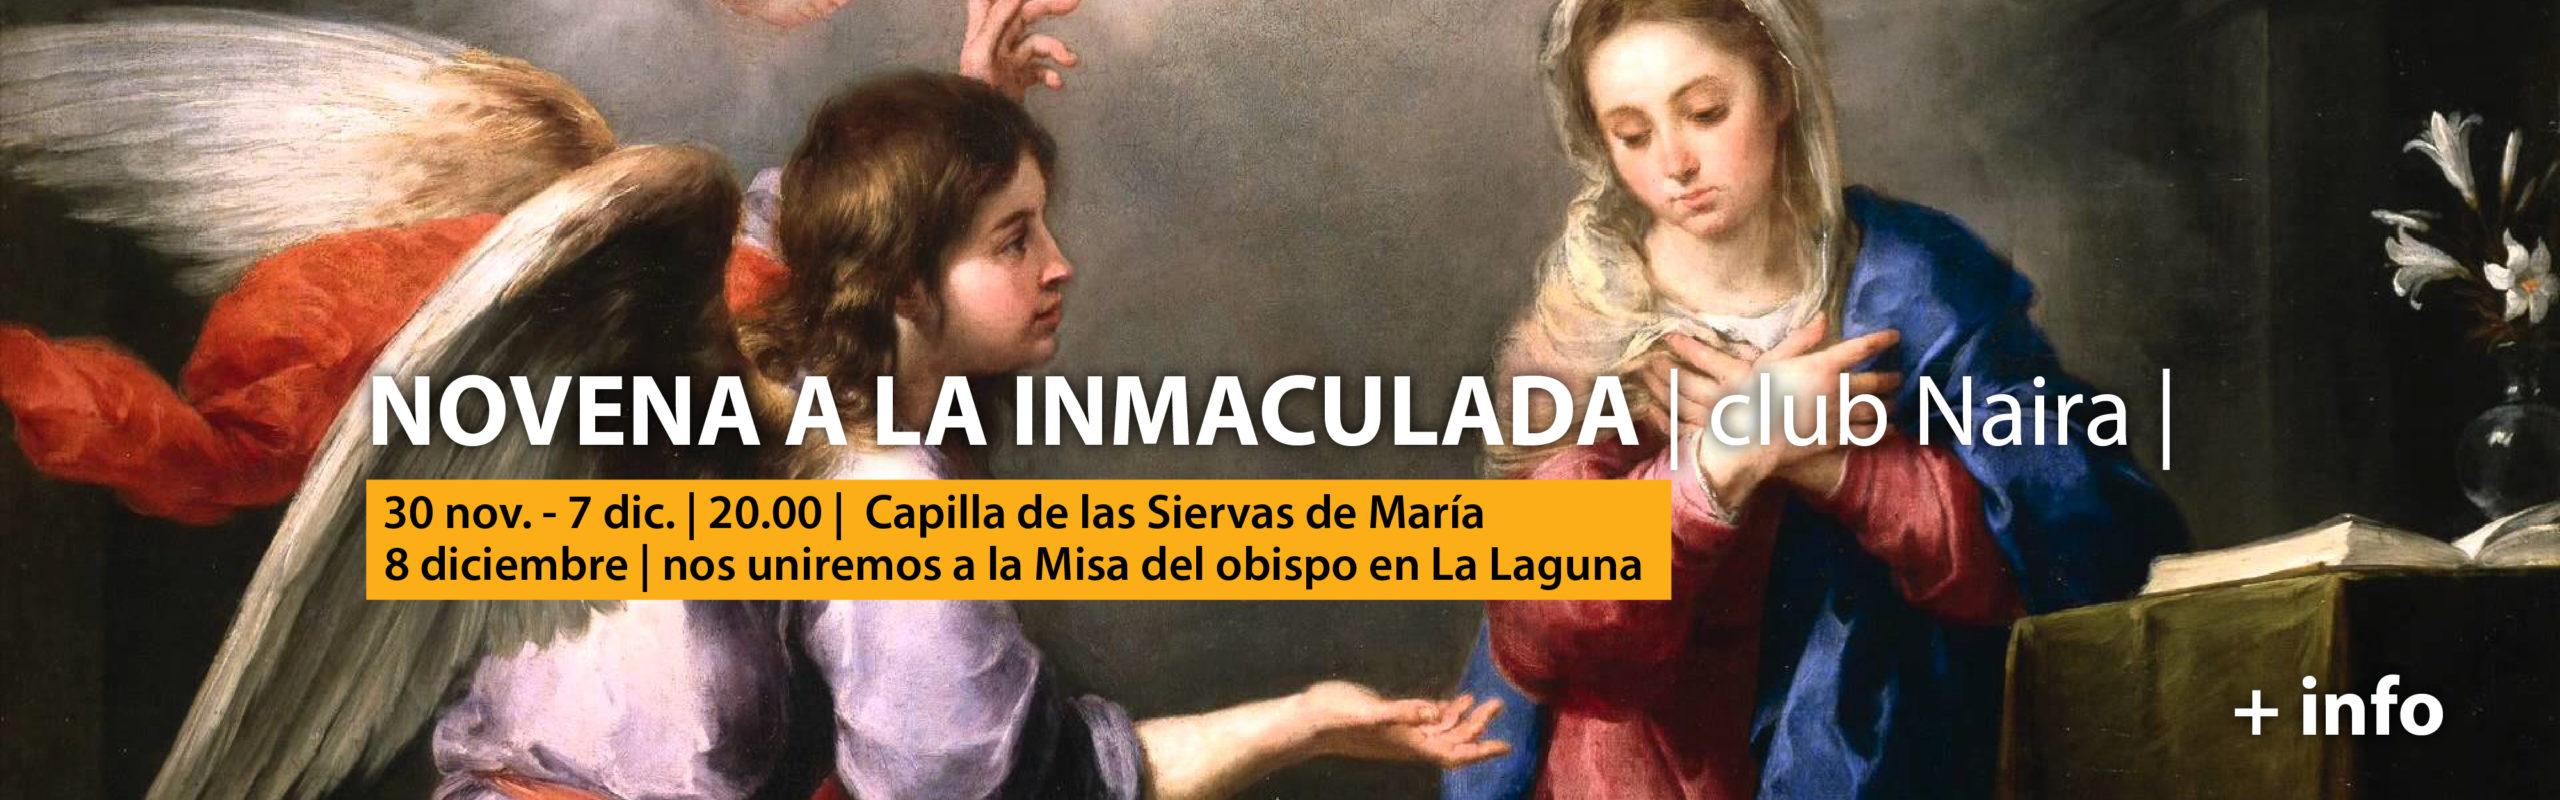 Banner_novena_inmaculada-01